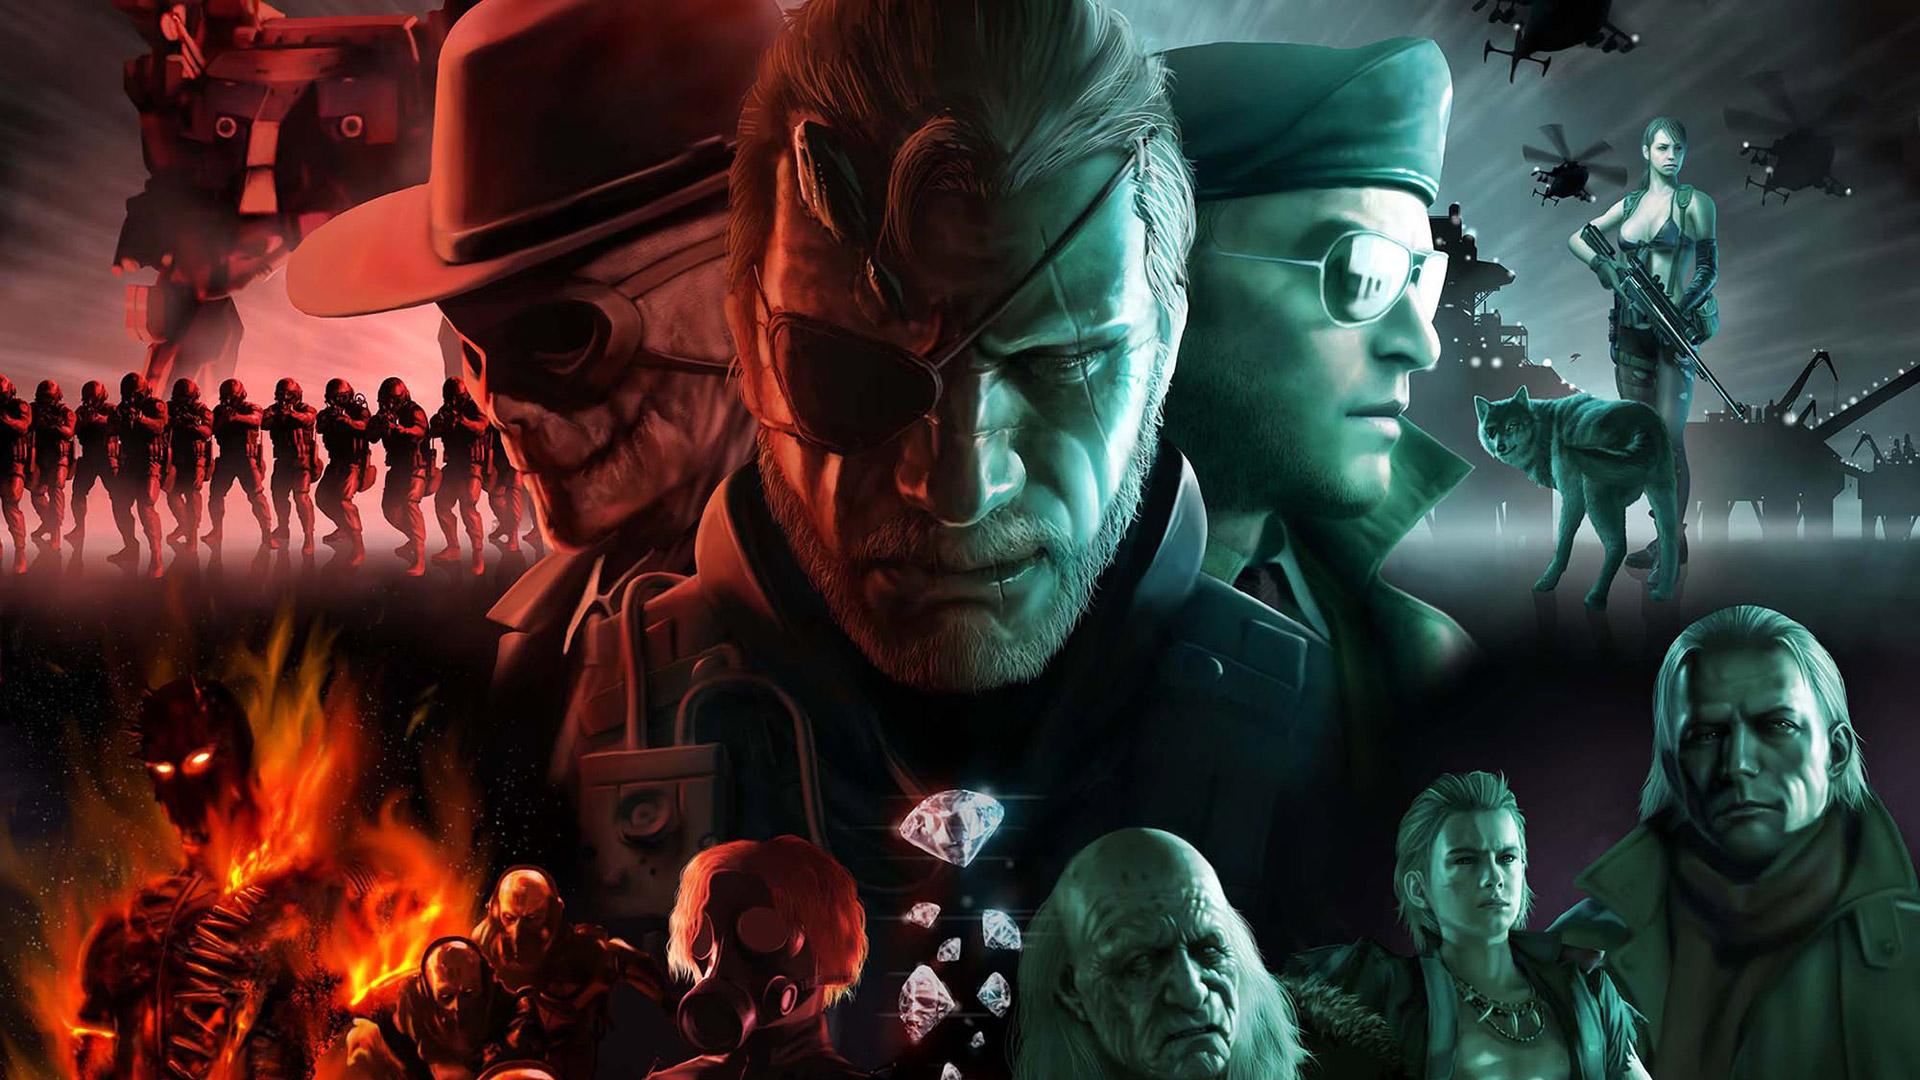 Metal Gear Solid V The Phantom Pain wallpaper 7